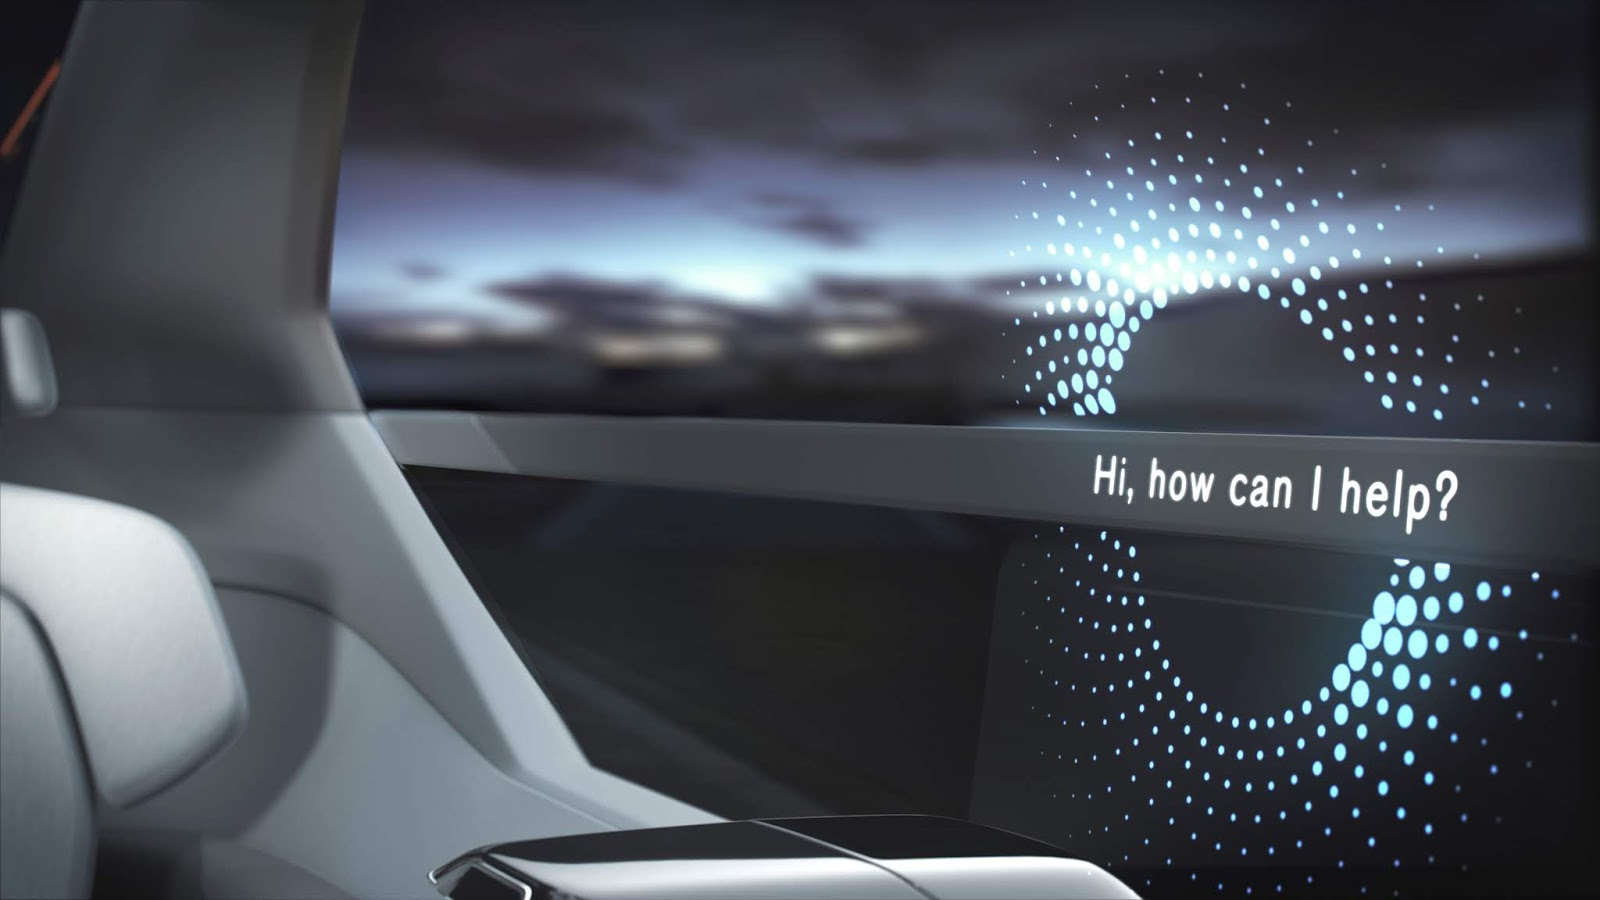 237050 Volvo 360c Interior Το όραμα της Volvo χωρίς... τιμόνι Electric cars, Volvo, αυτόνομα, Αυτόνομη οδήγηση, Τεχνολογία